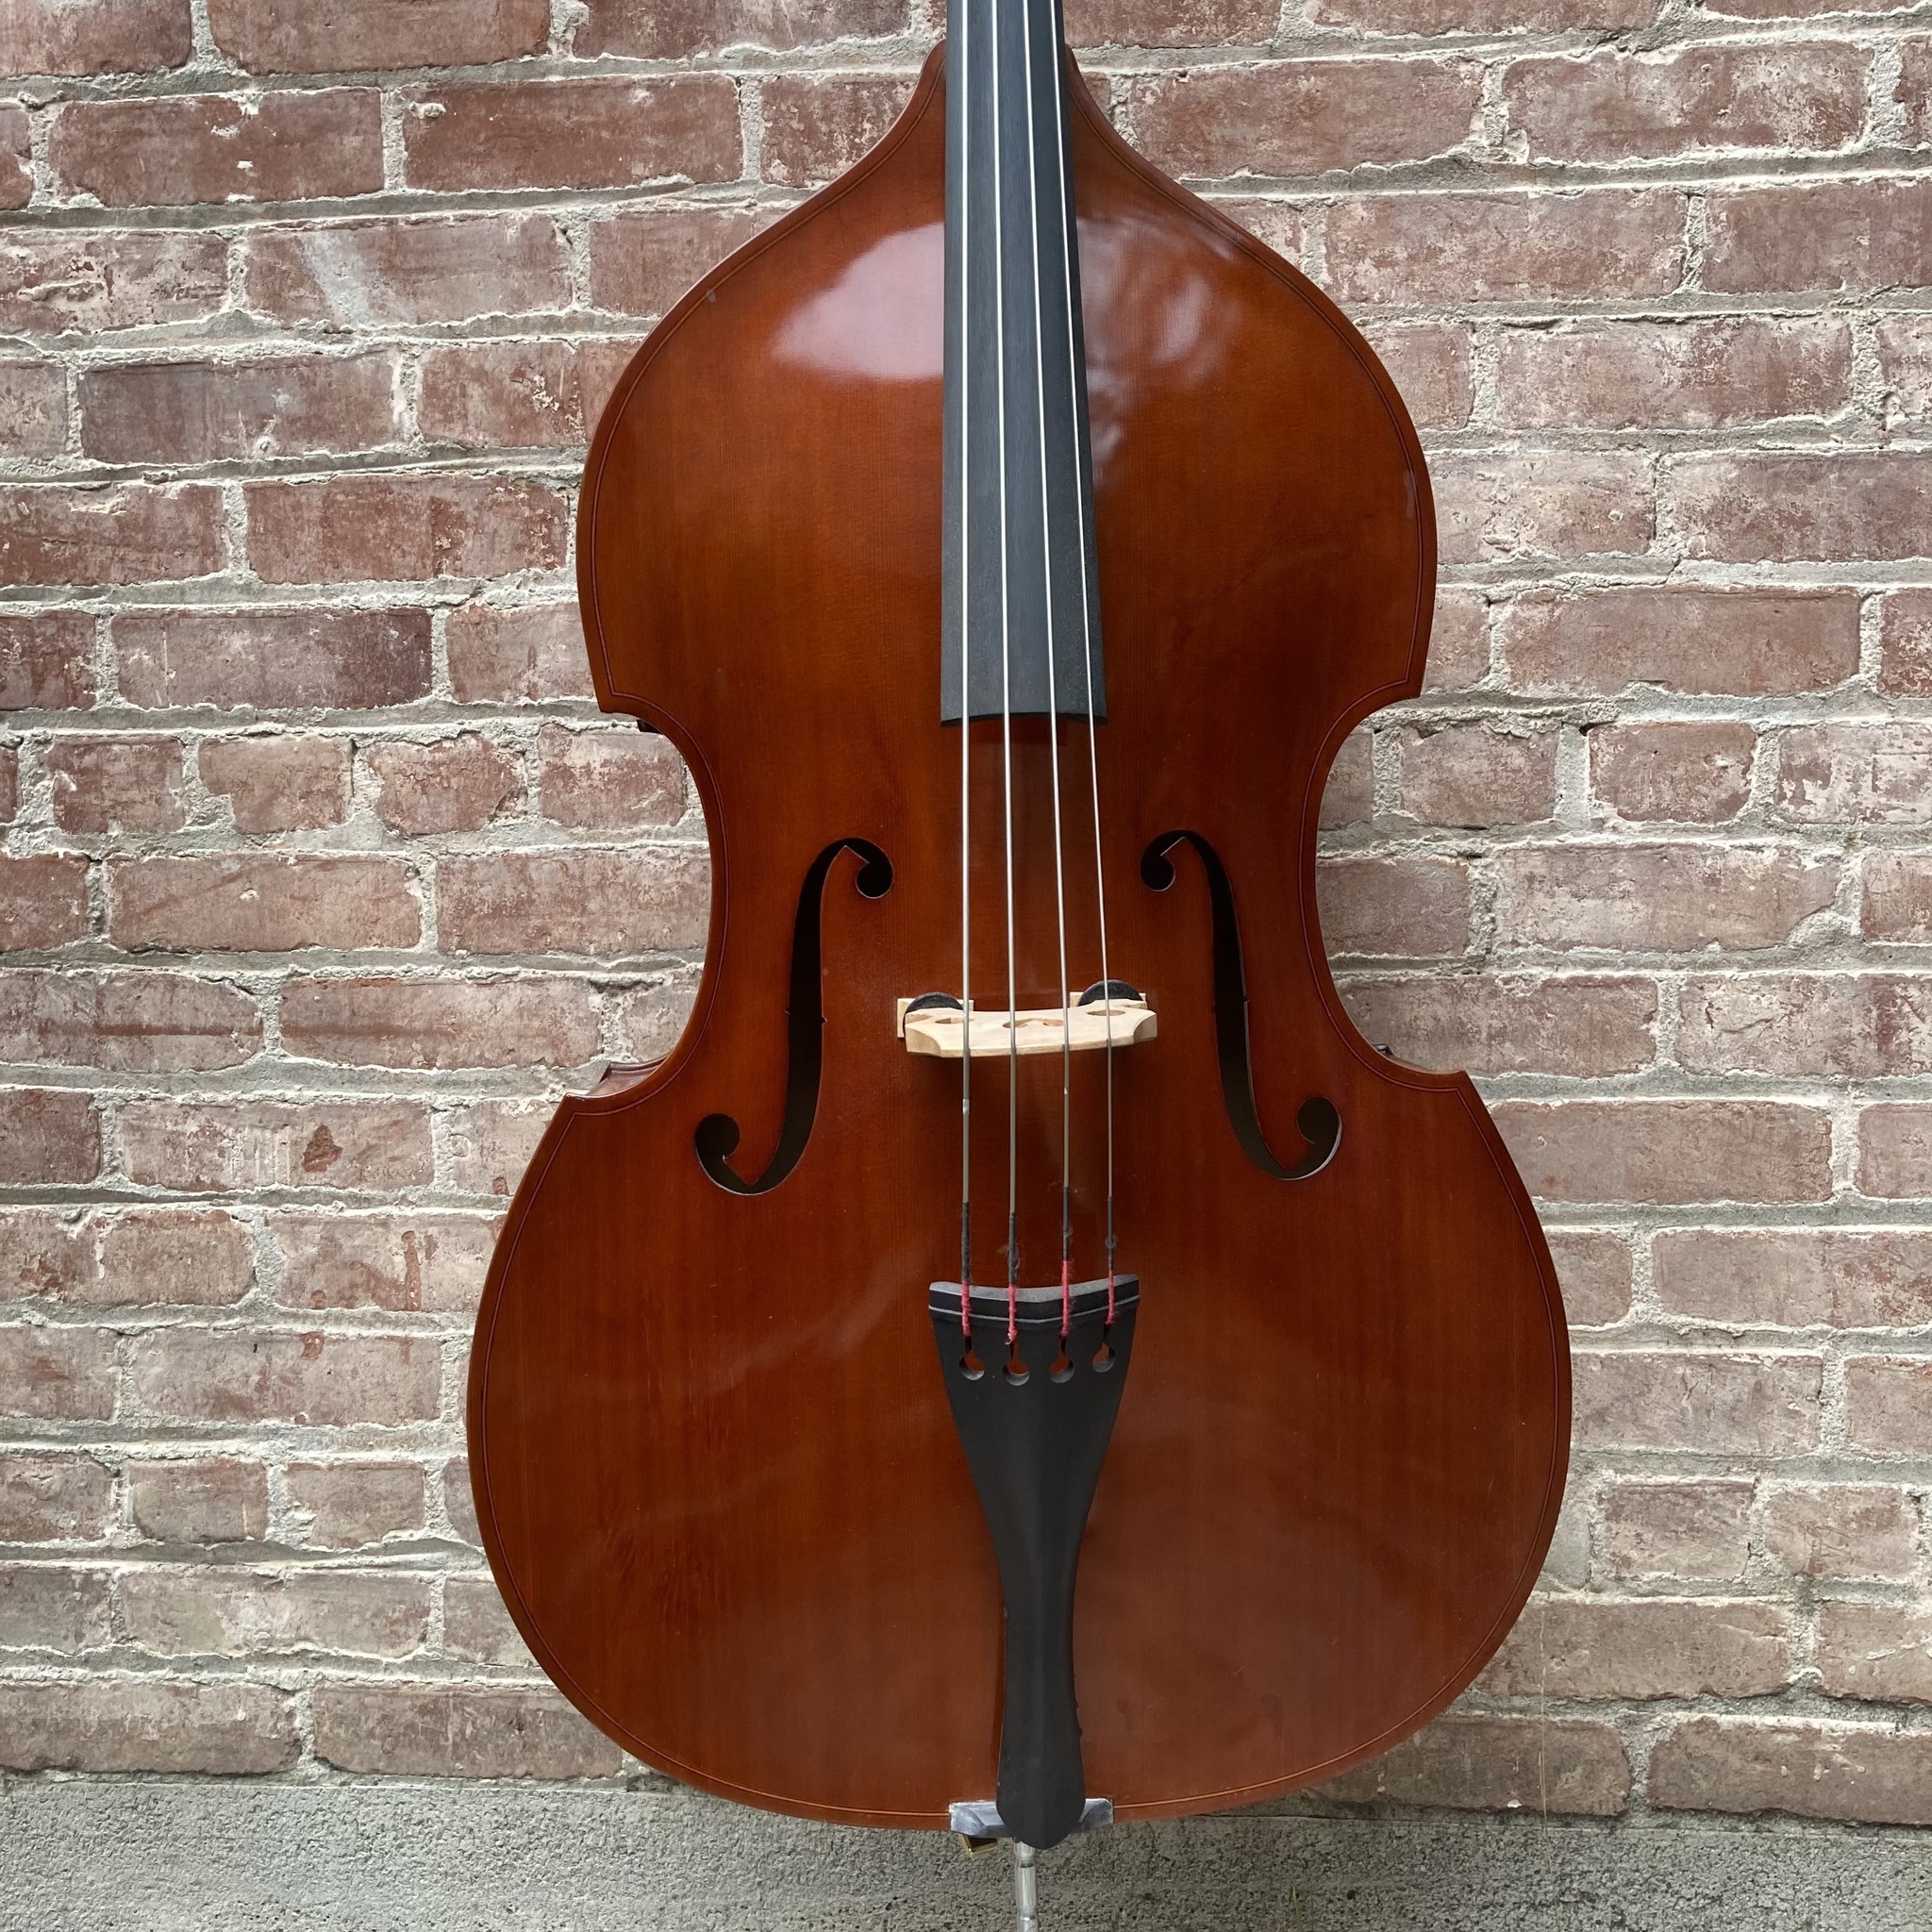 J.I. Strings J.I. Strings 1/8 laminated bass